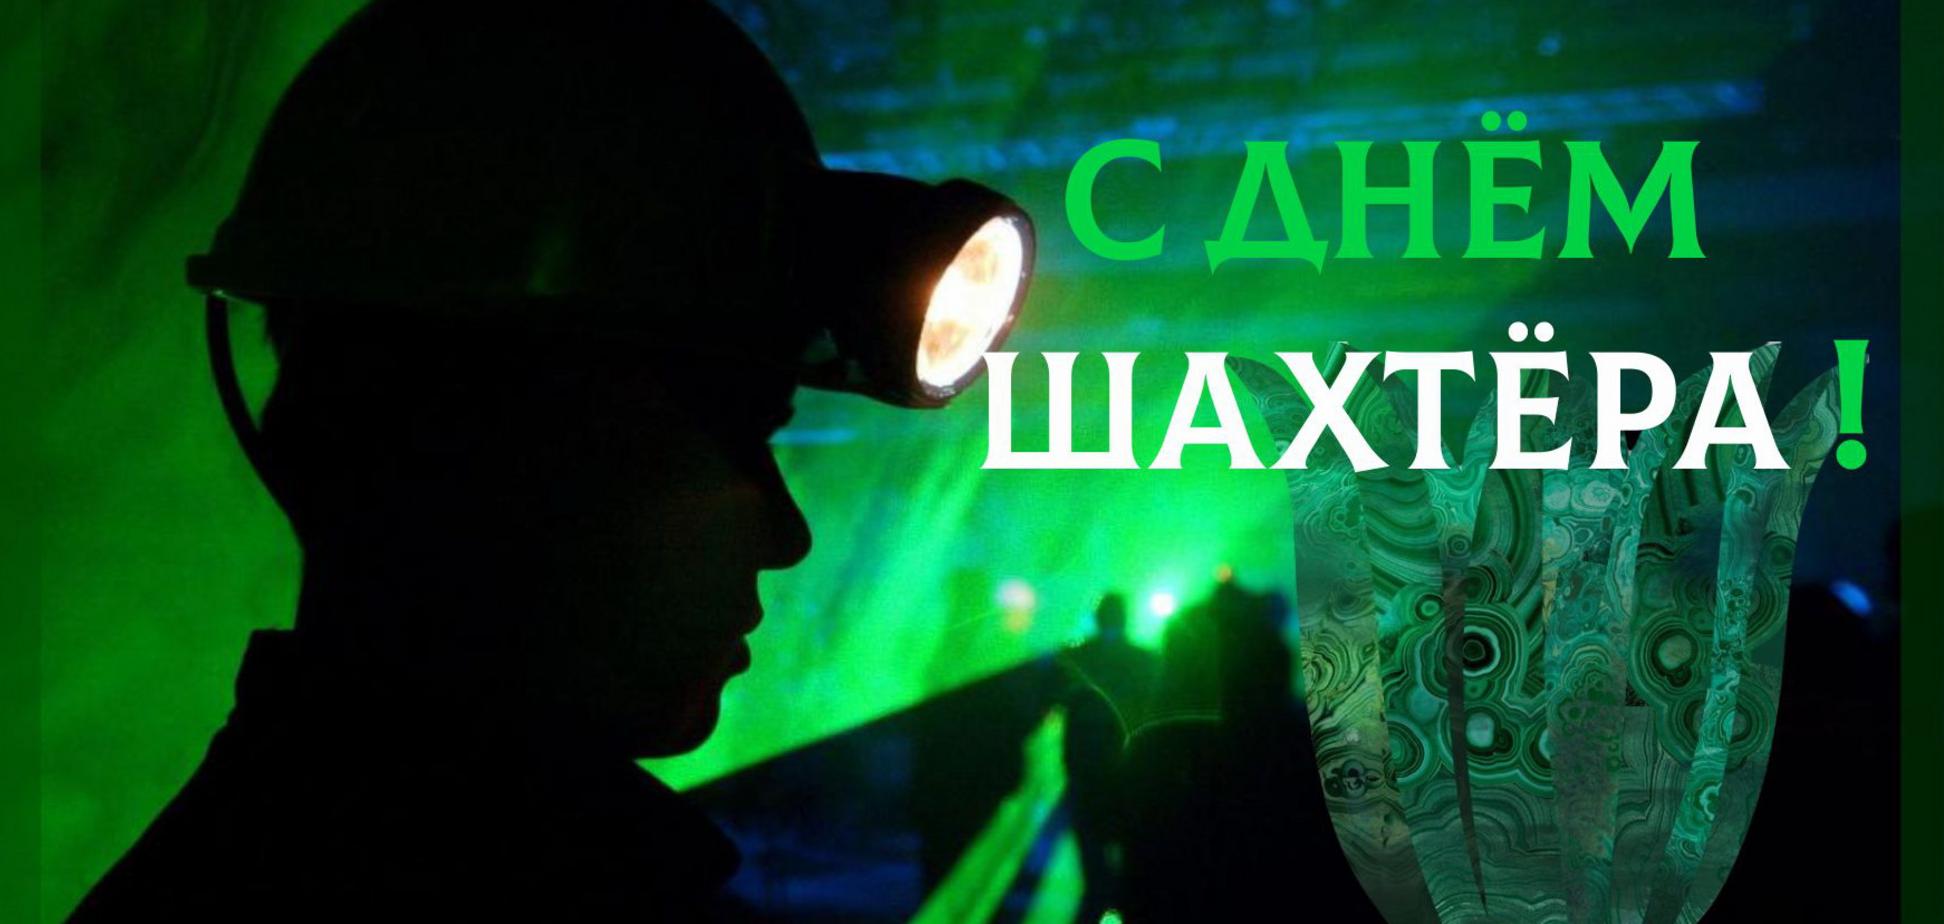 День шахтаря святкували ще за часів СРСР